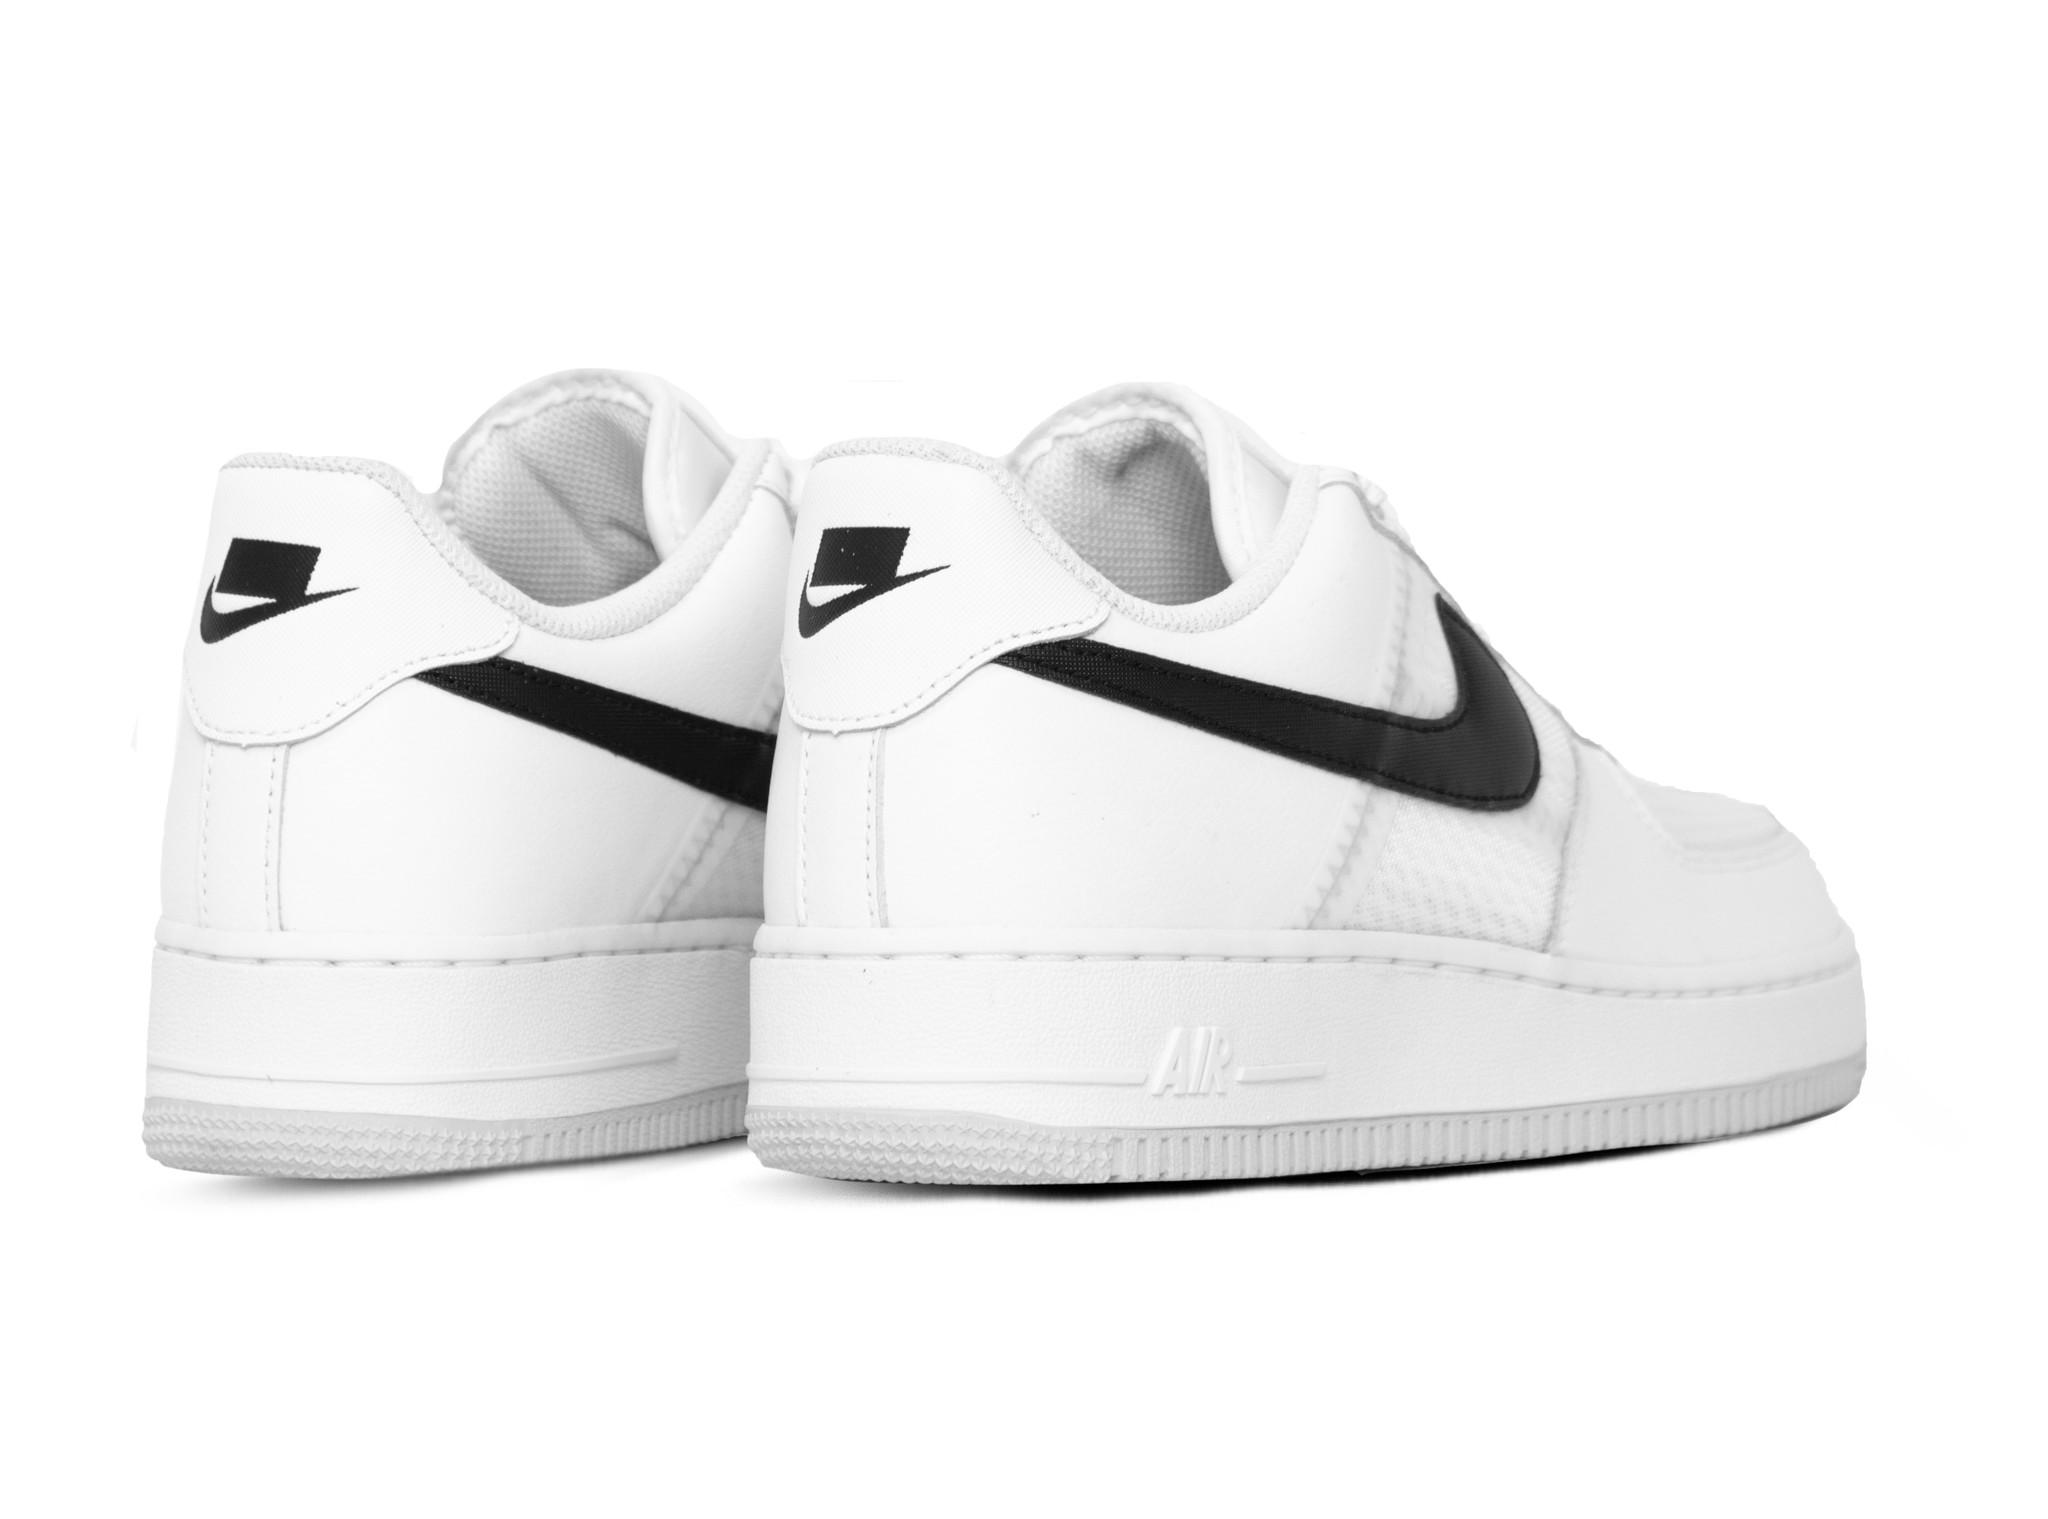 Nike Air Force 1 '07 LV8 White Black Pure Platinum CI0060 100